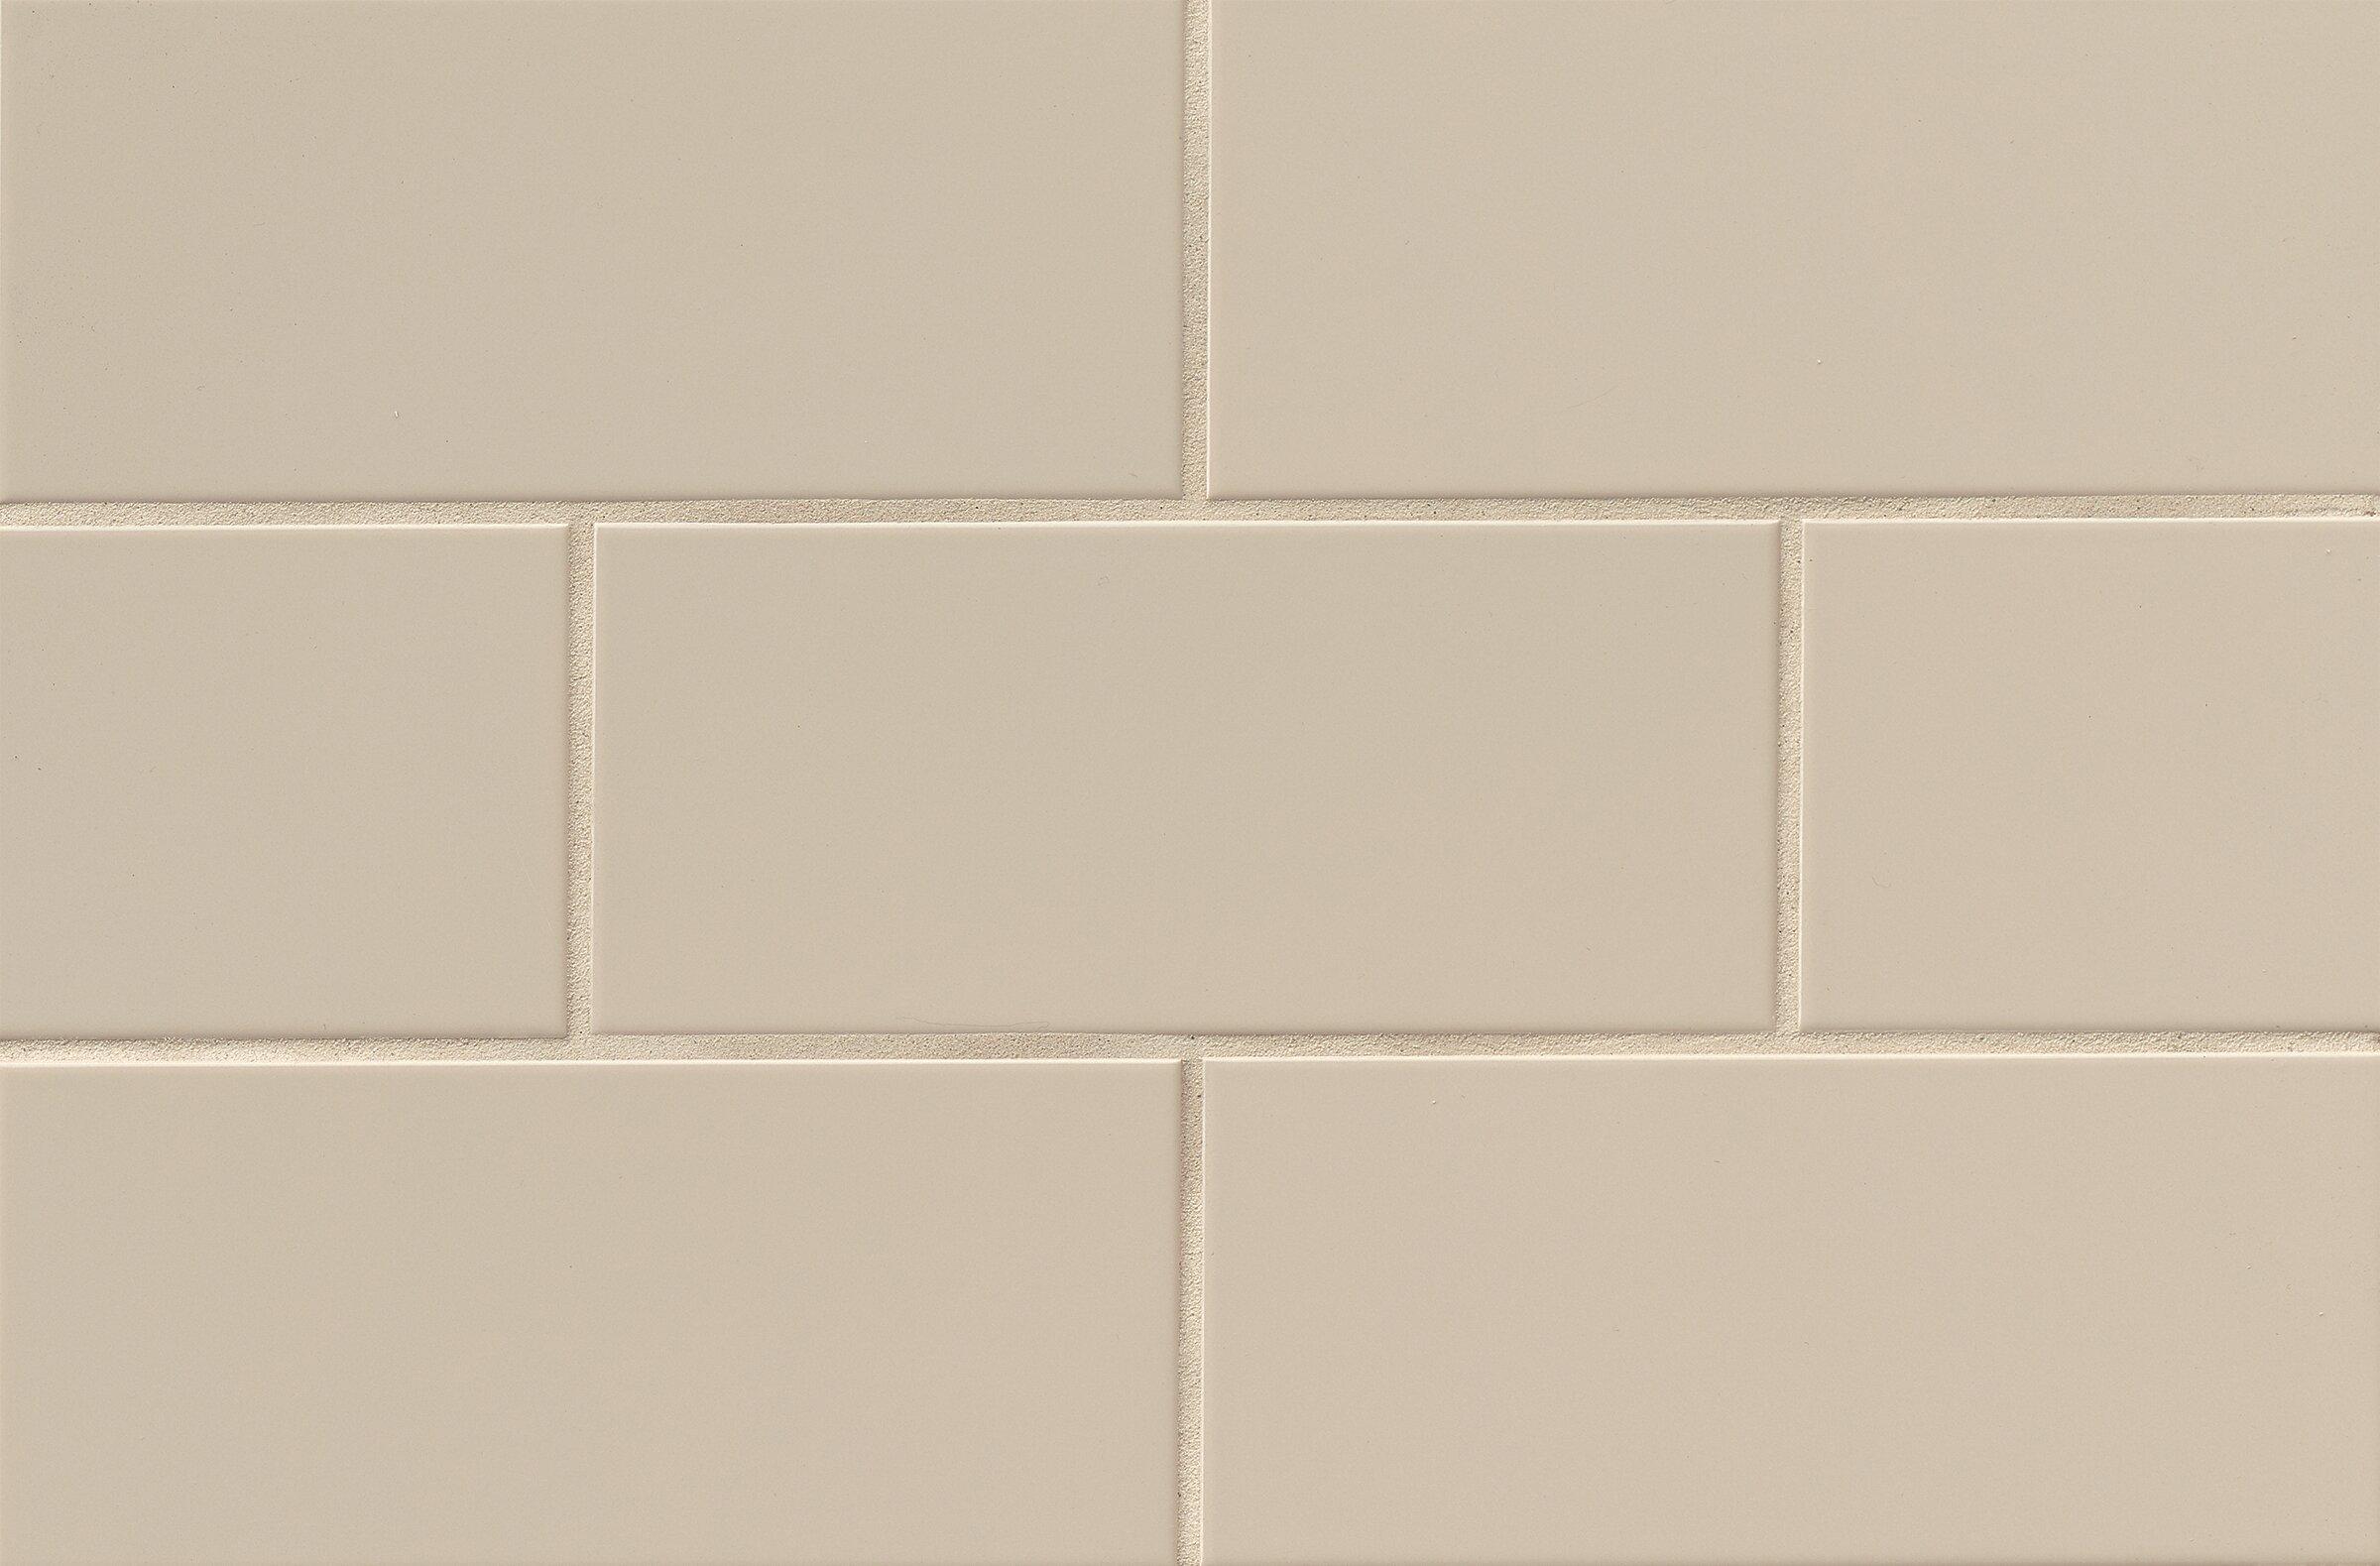 Parvatile nantucket 425 x 10 ceramic subway tile in gloss dune parvatile nantucket 425 x 10 ceramic subway tile in gloss dune wayfair dailygadgetfo Choice Image